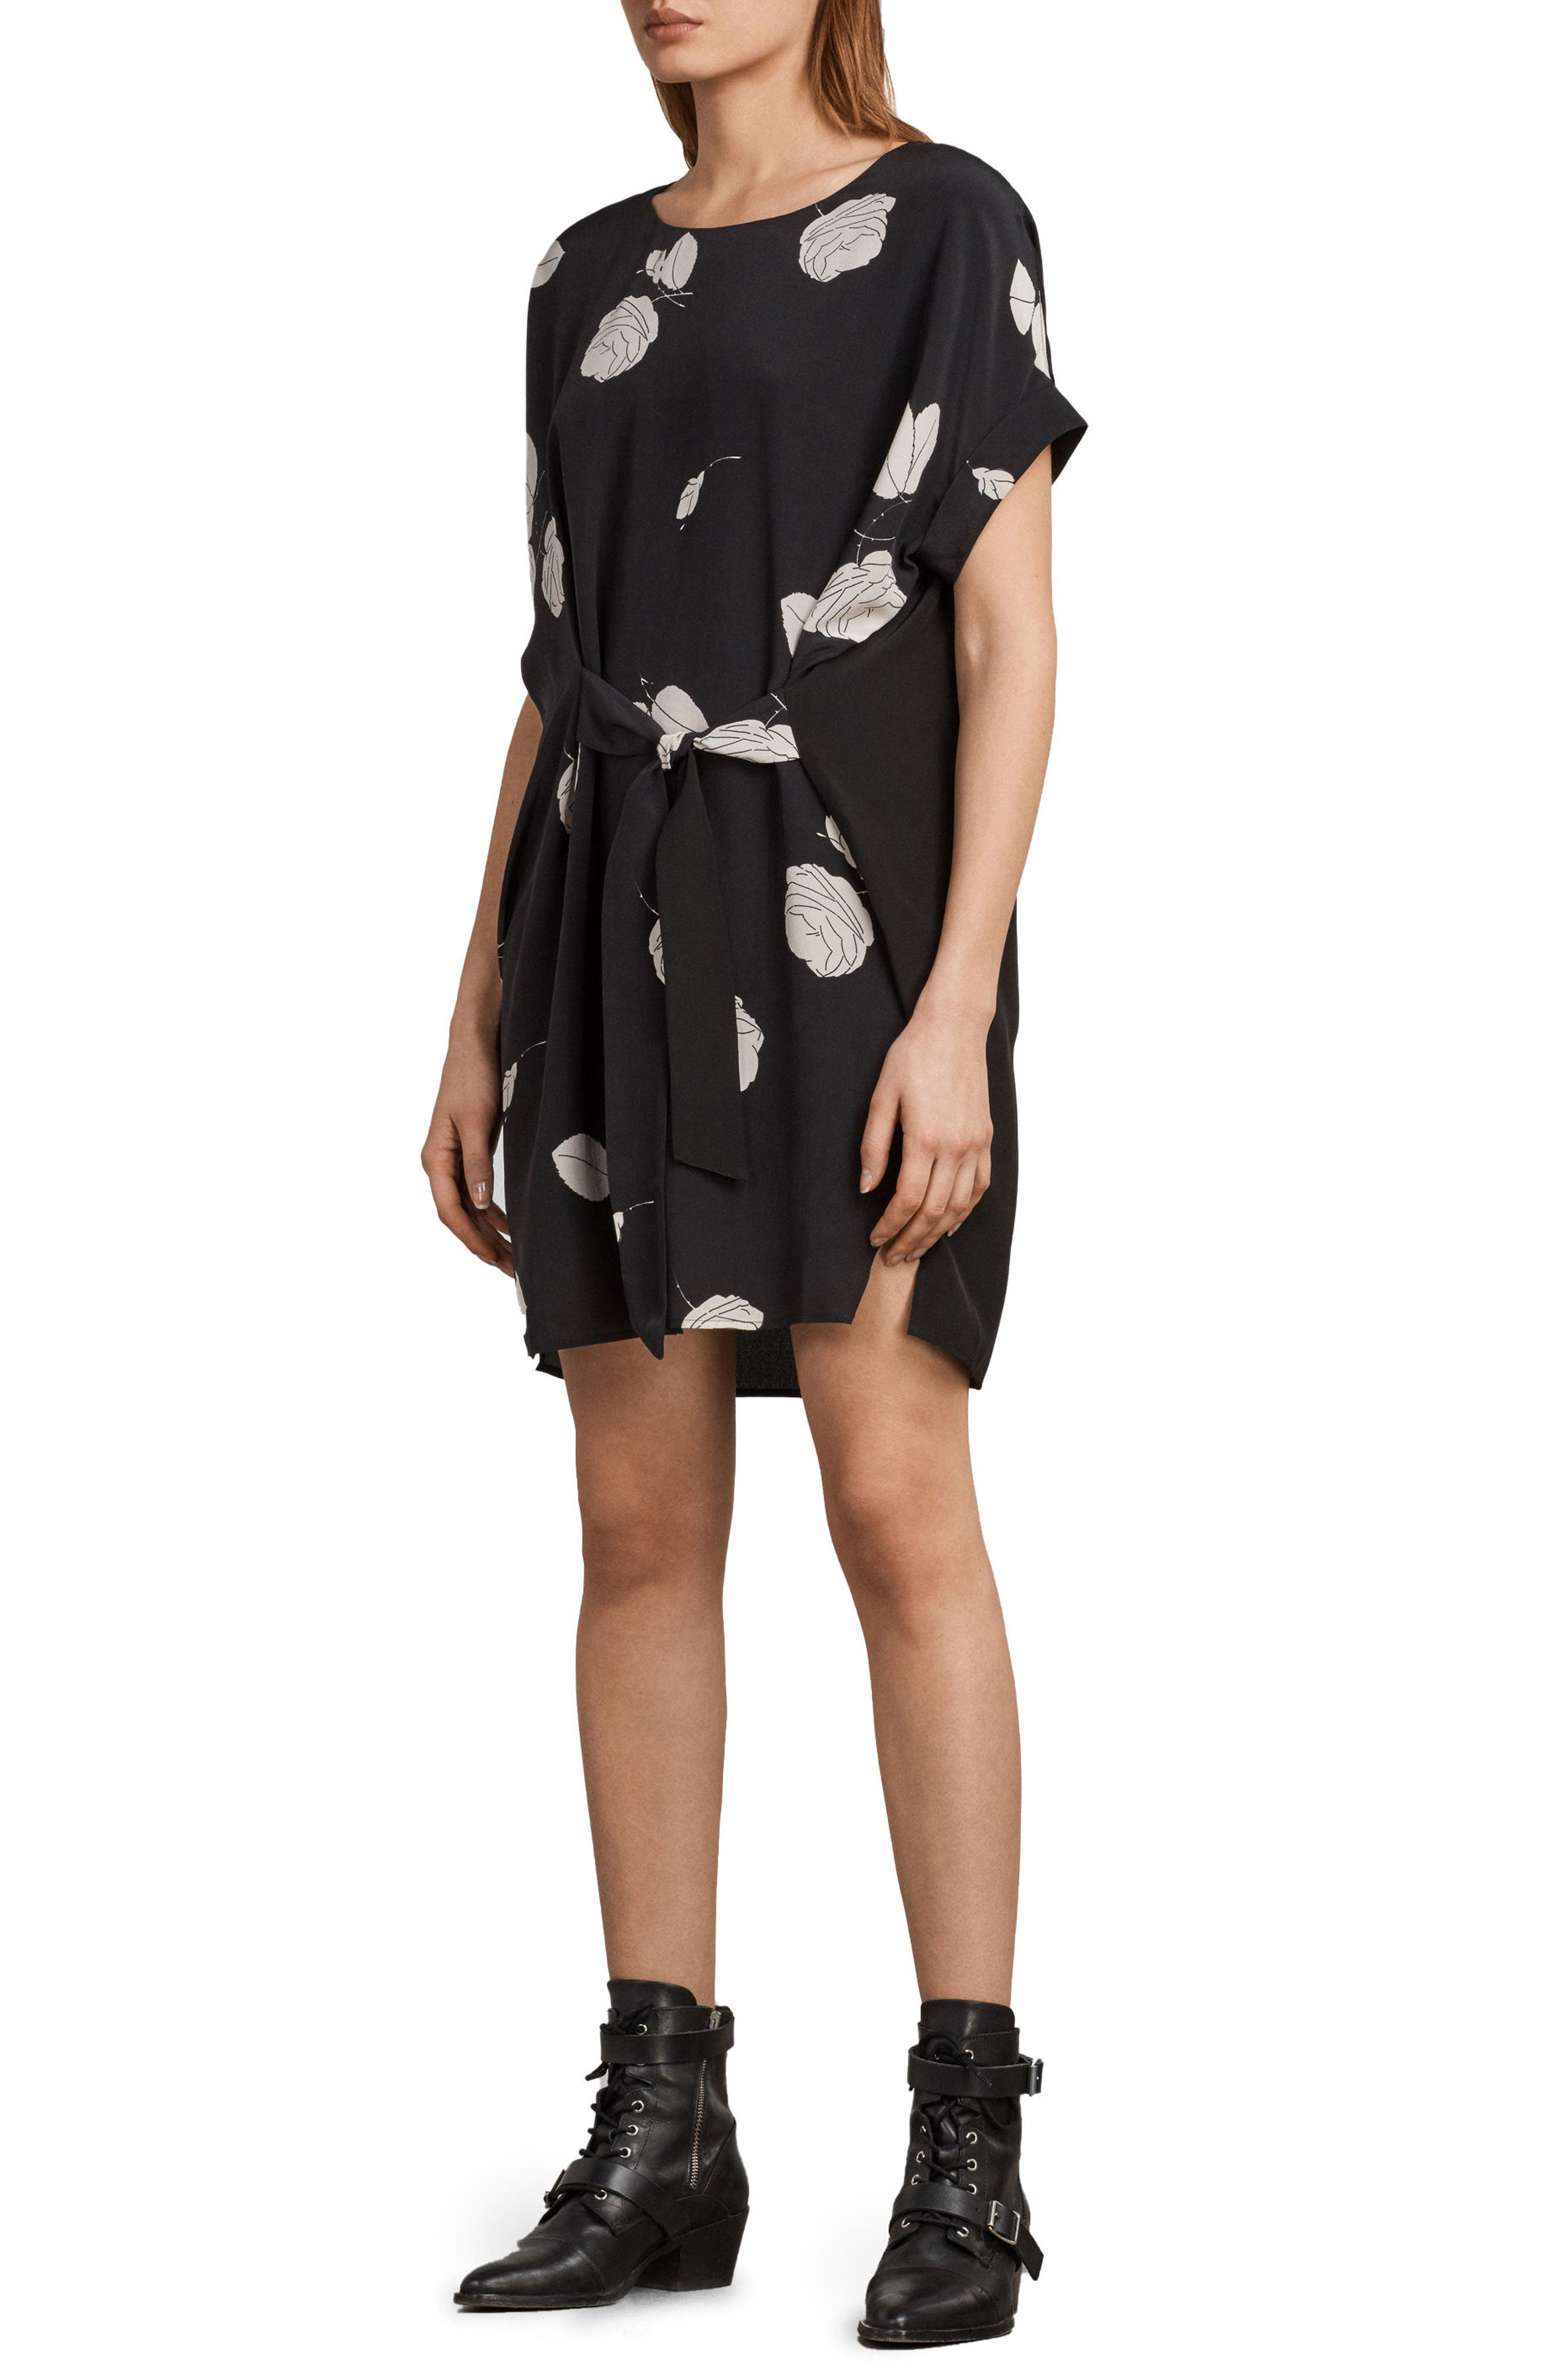 Sonny Rodin Silk Dress,                             Alternate thumbnail 6, color,                             001